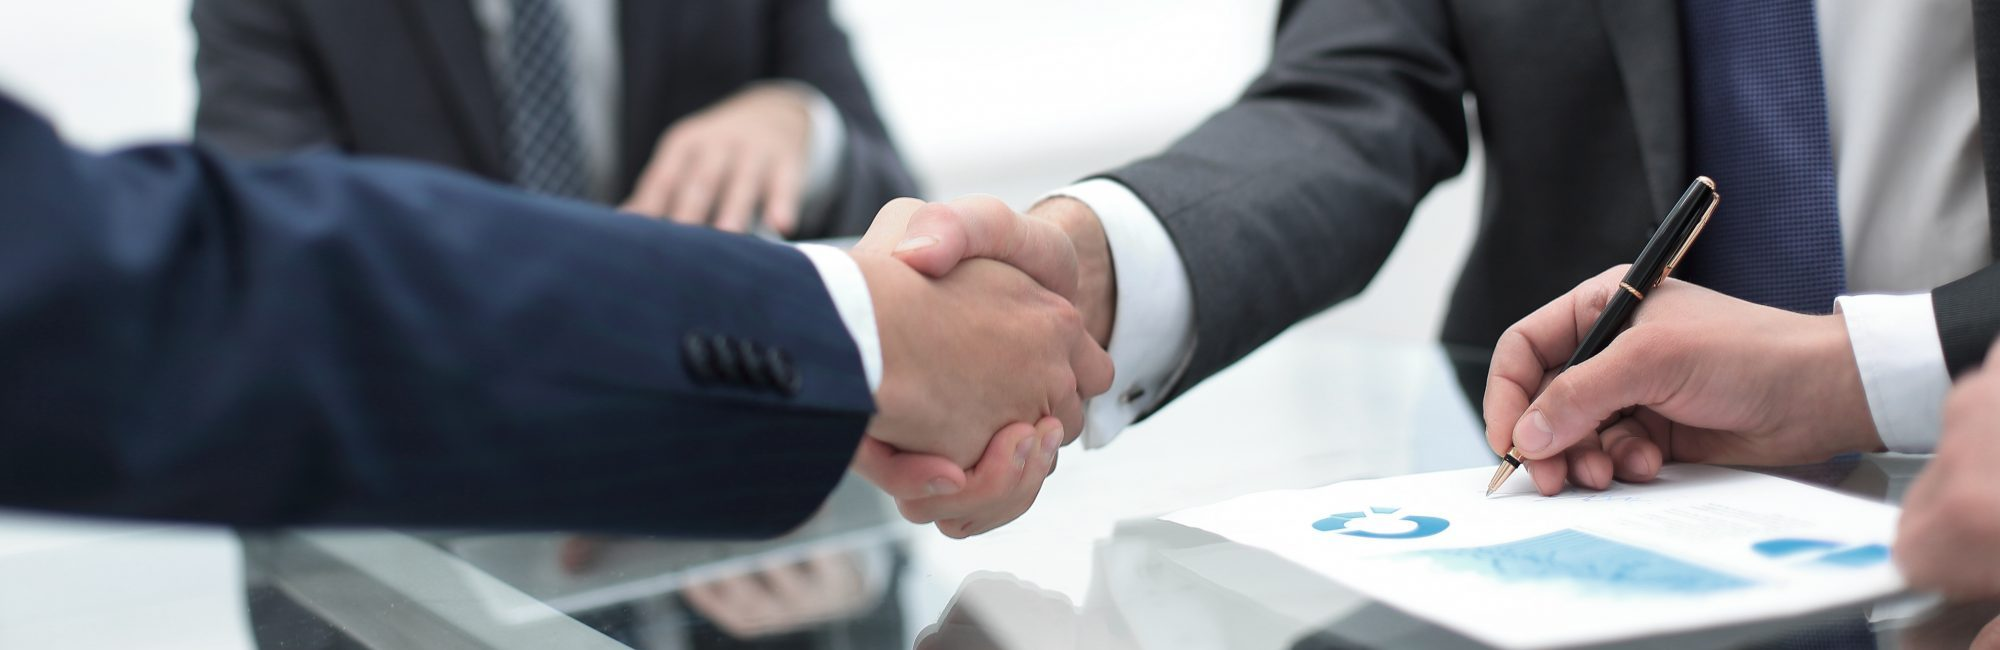 close up of handshake agreement